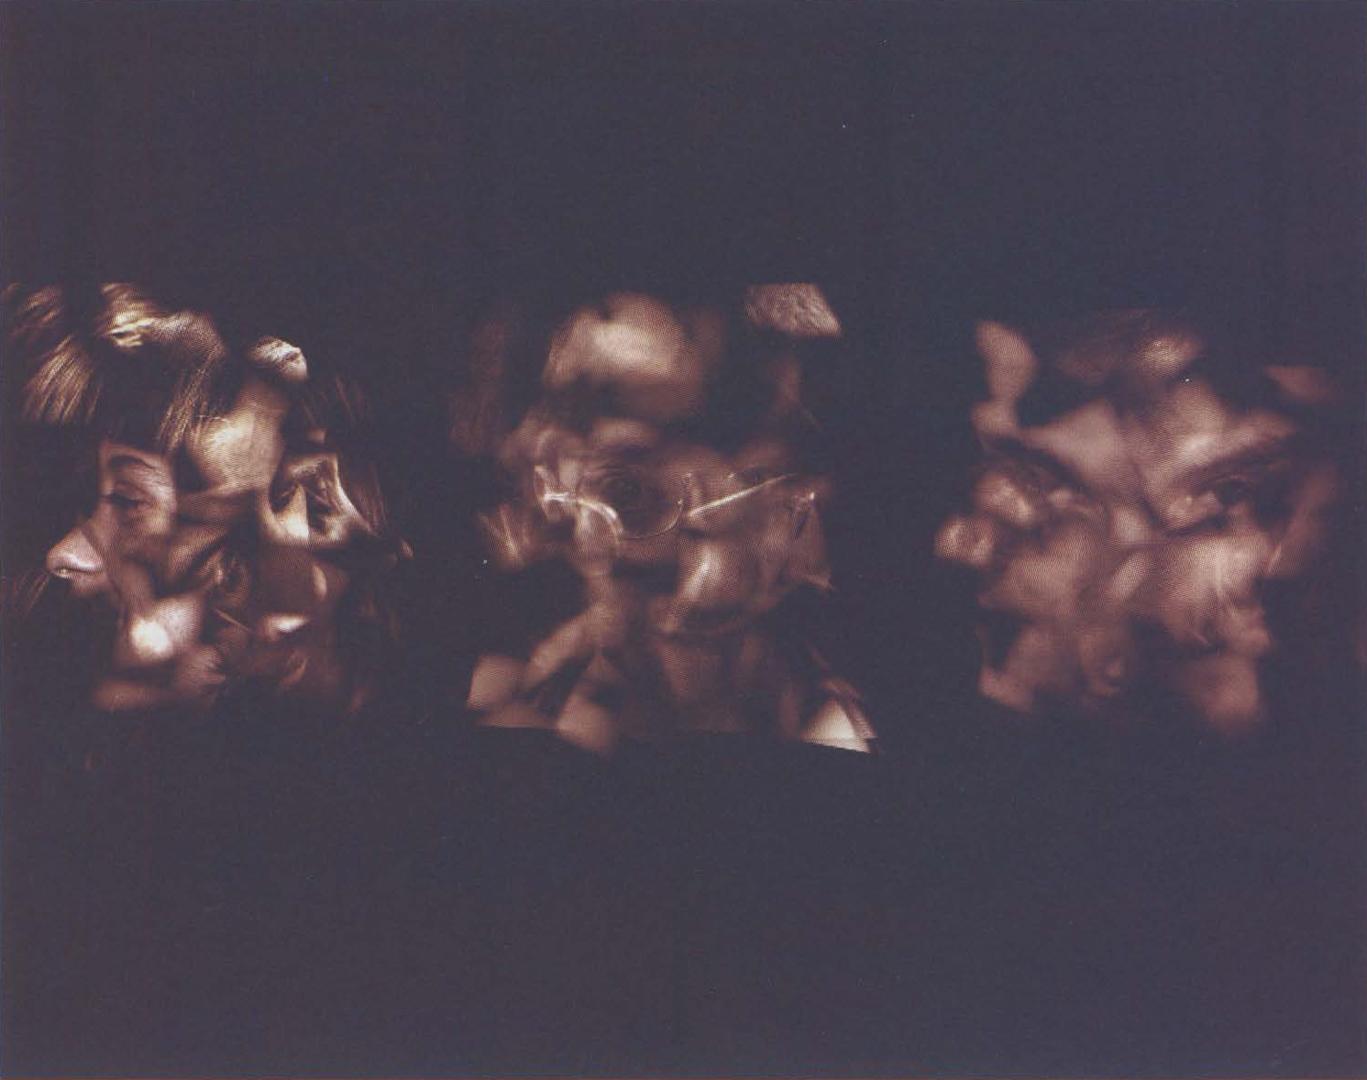 ©2003, Susan Sloan